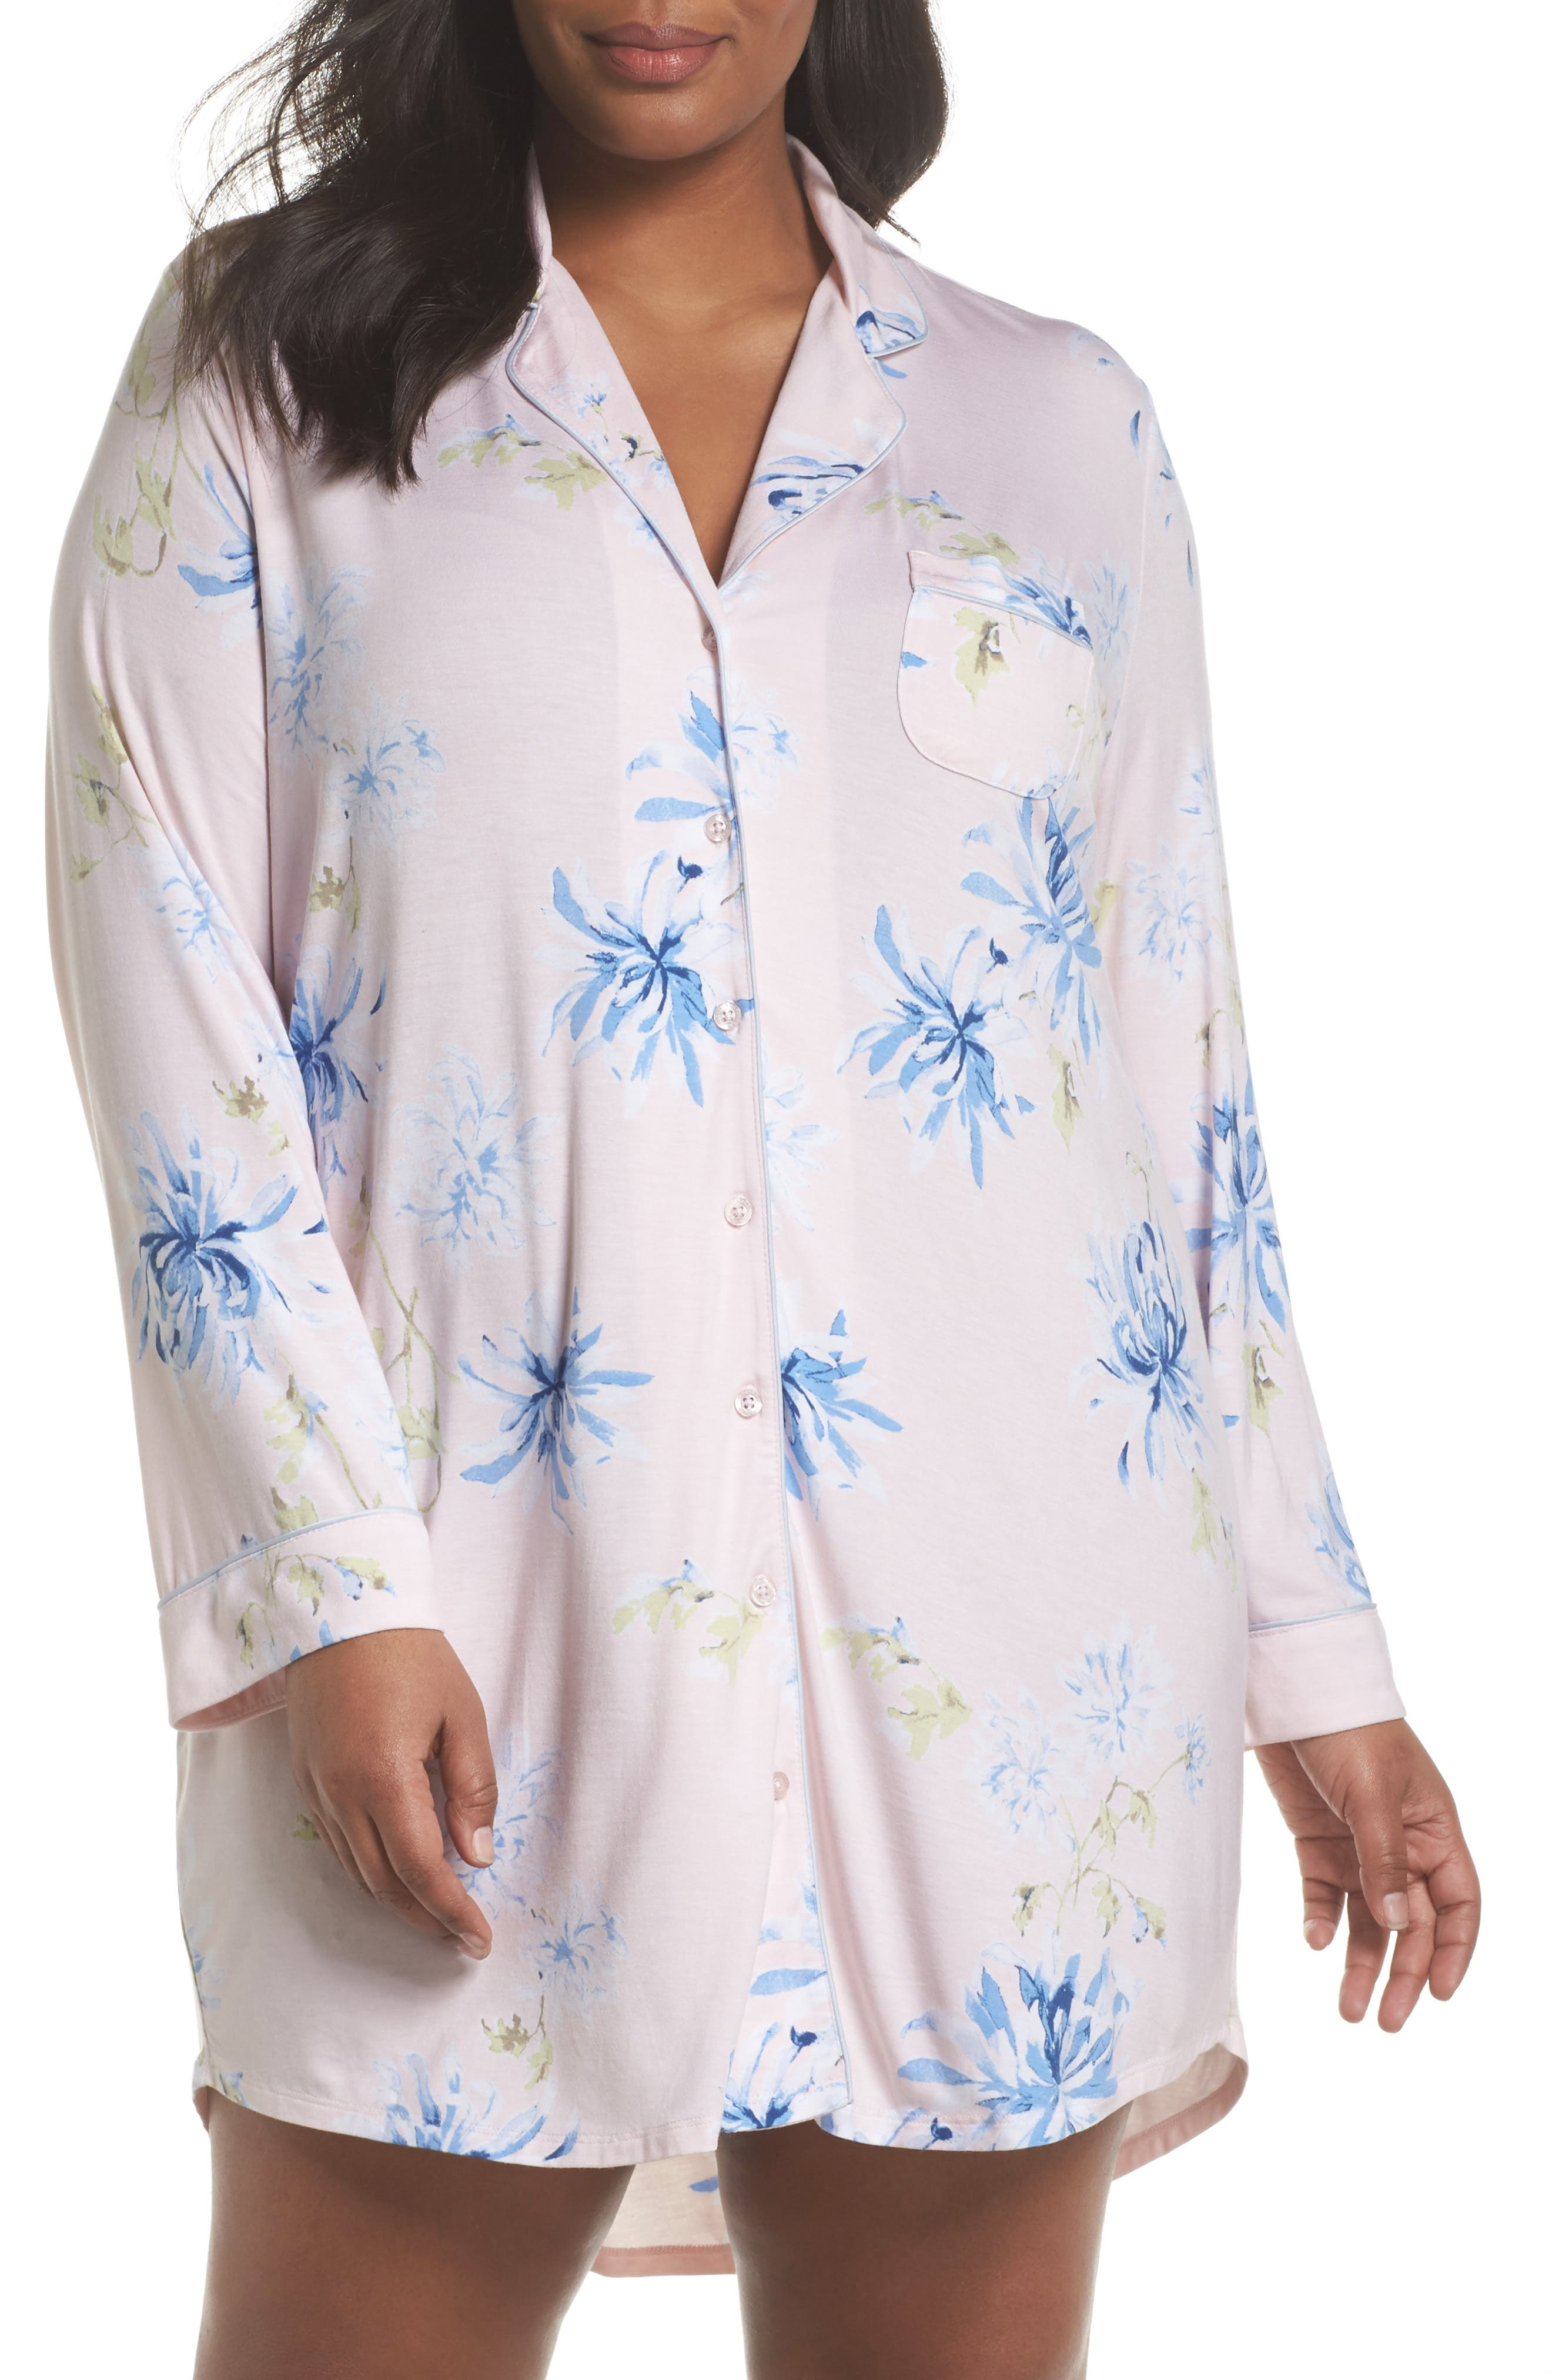 Nordstrom Lingerie 'Moonlight' Nightshirt (Plus Size)